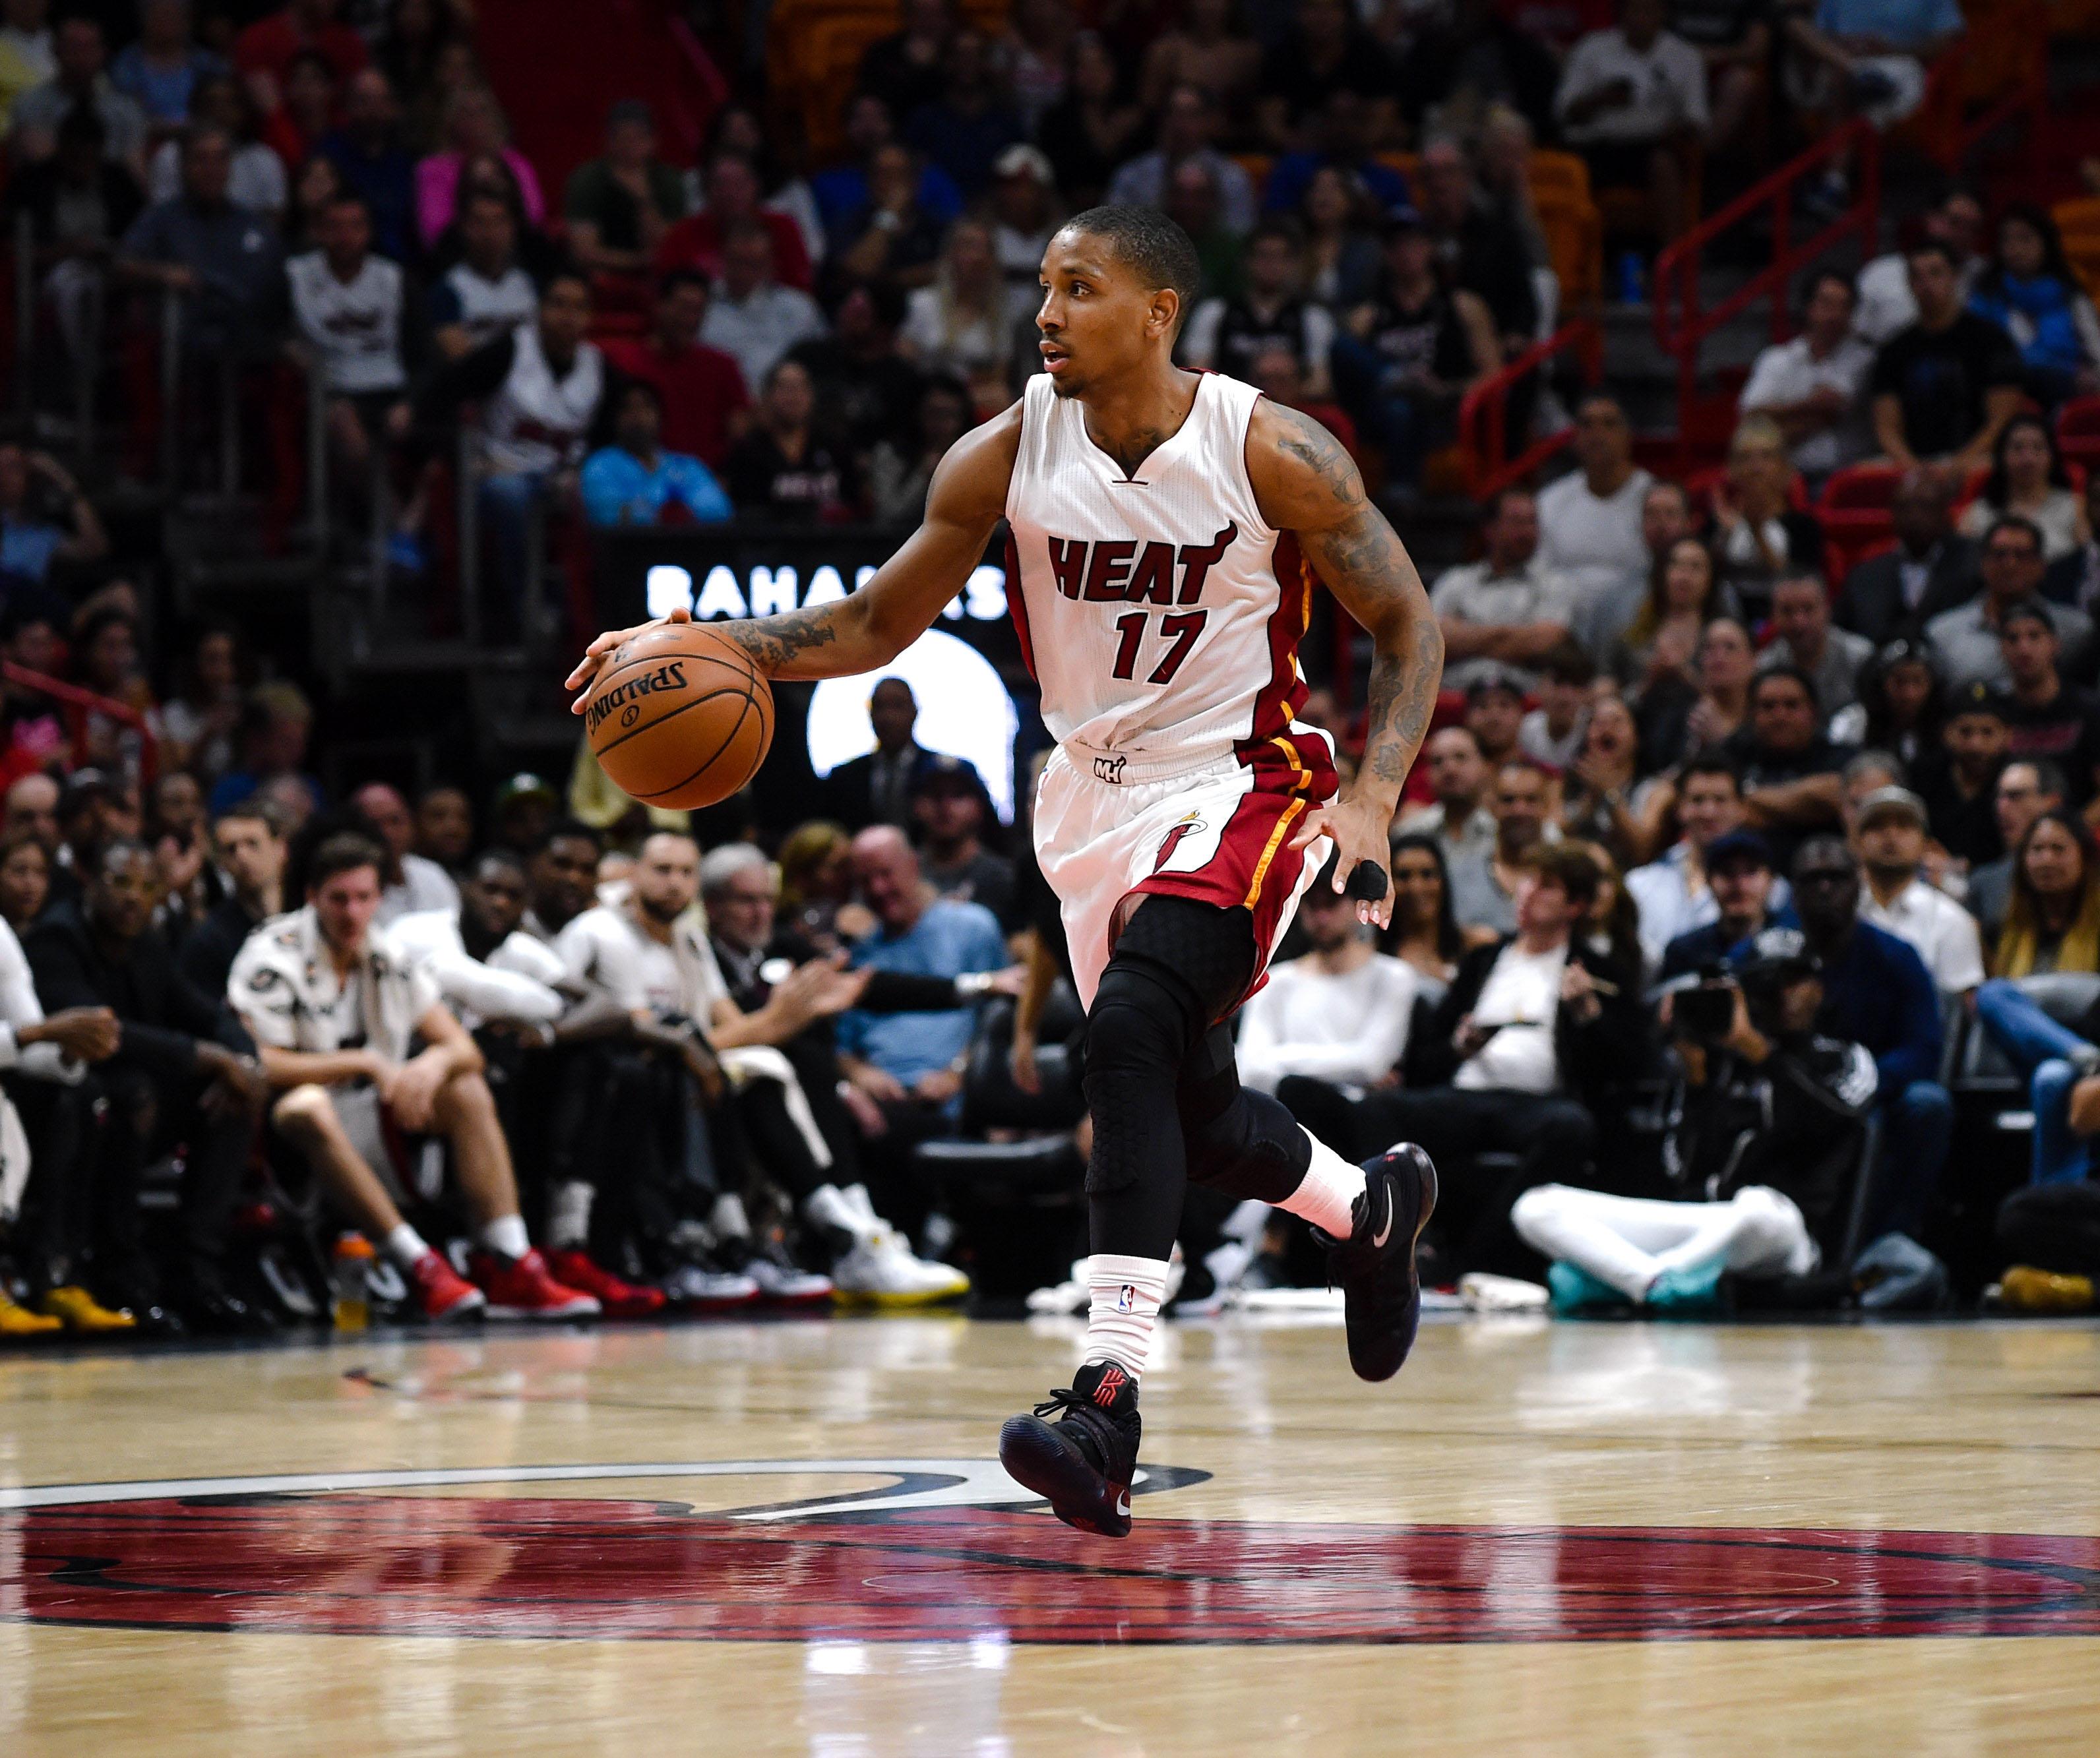 Mi miami heat hoopshype - Miami Heat 2016 2017 Line Up 24